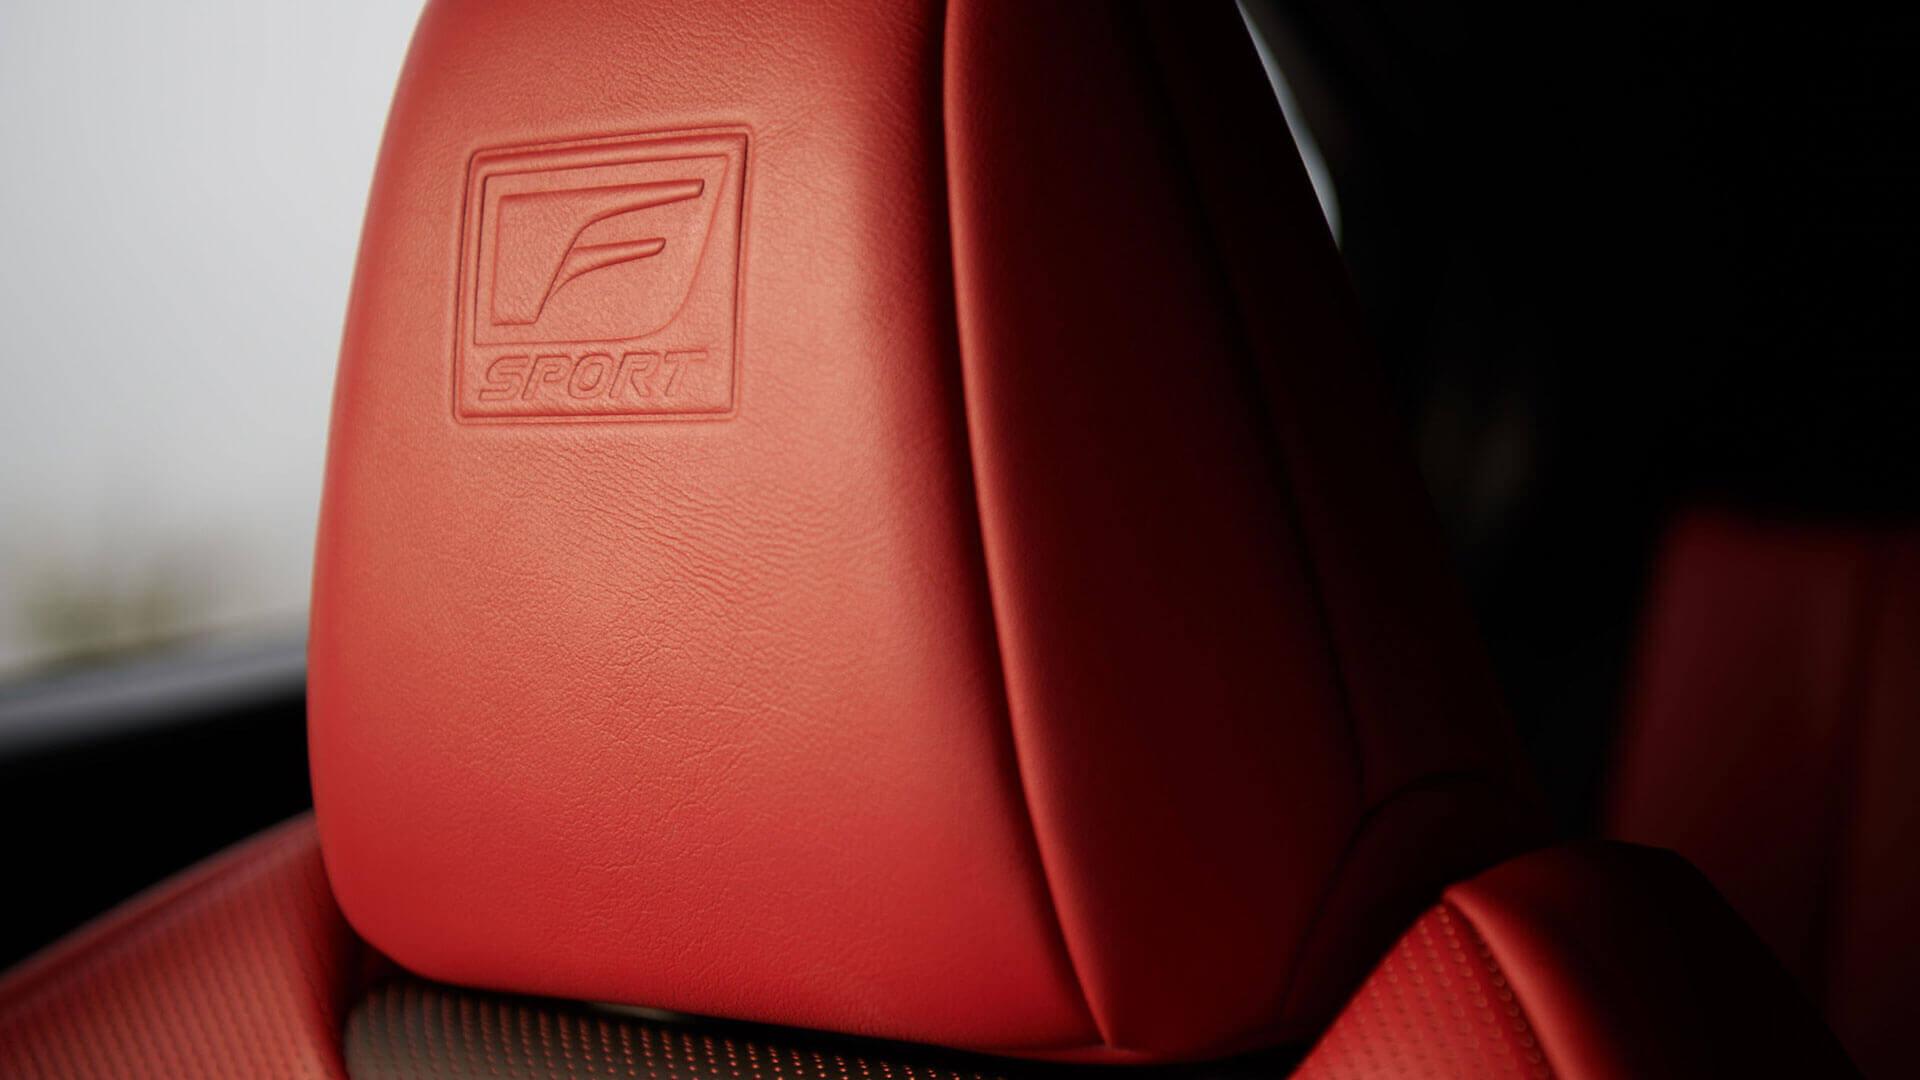 Lexus F-Sport seat